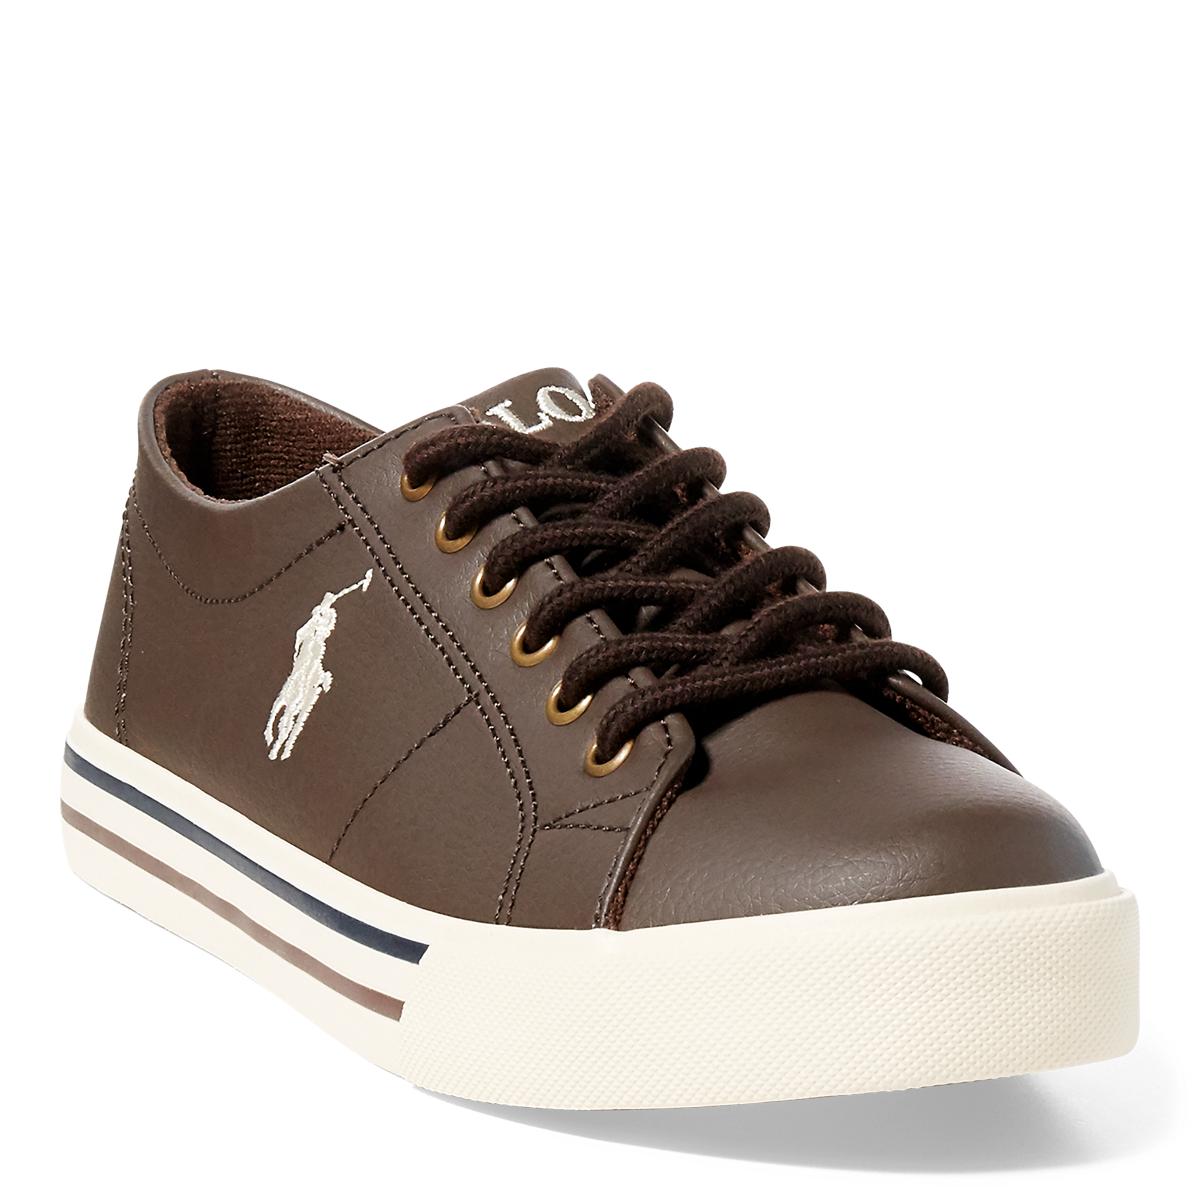 1450ed3ac401ed Scholar Faux-Leather Sneaker - Sneakers Big Kid (sizes 3.5-7 ...